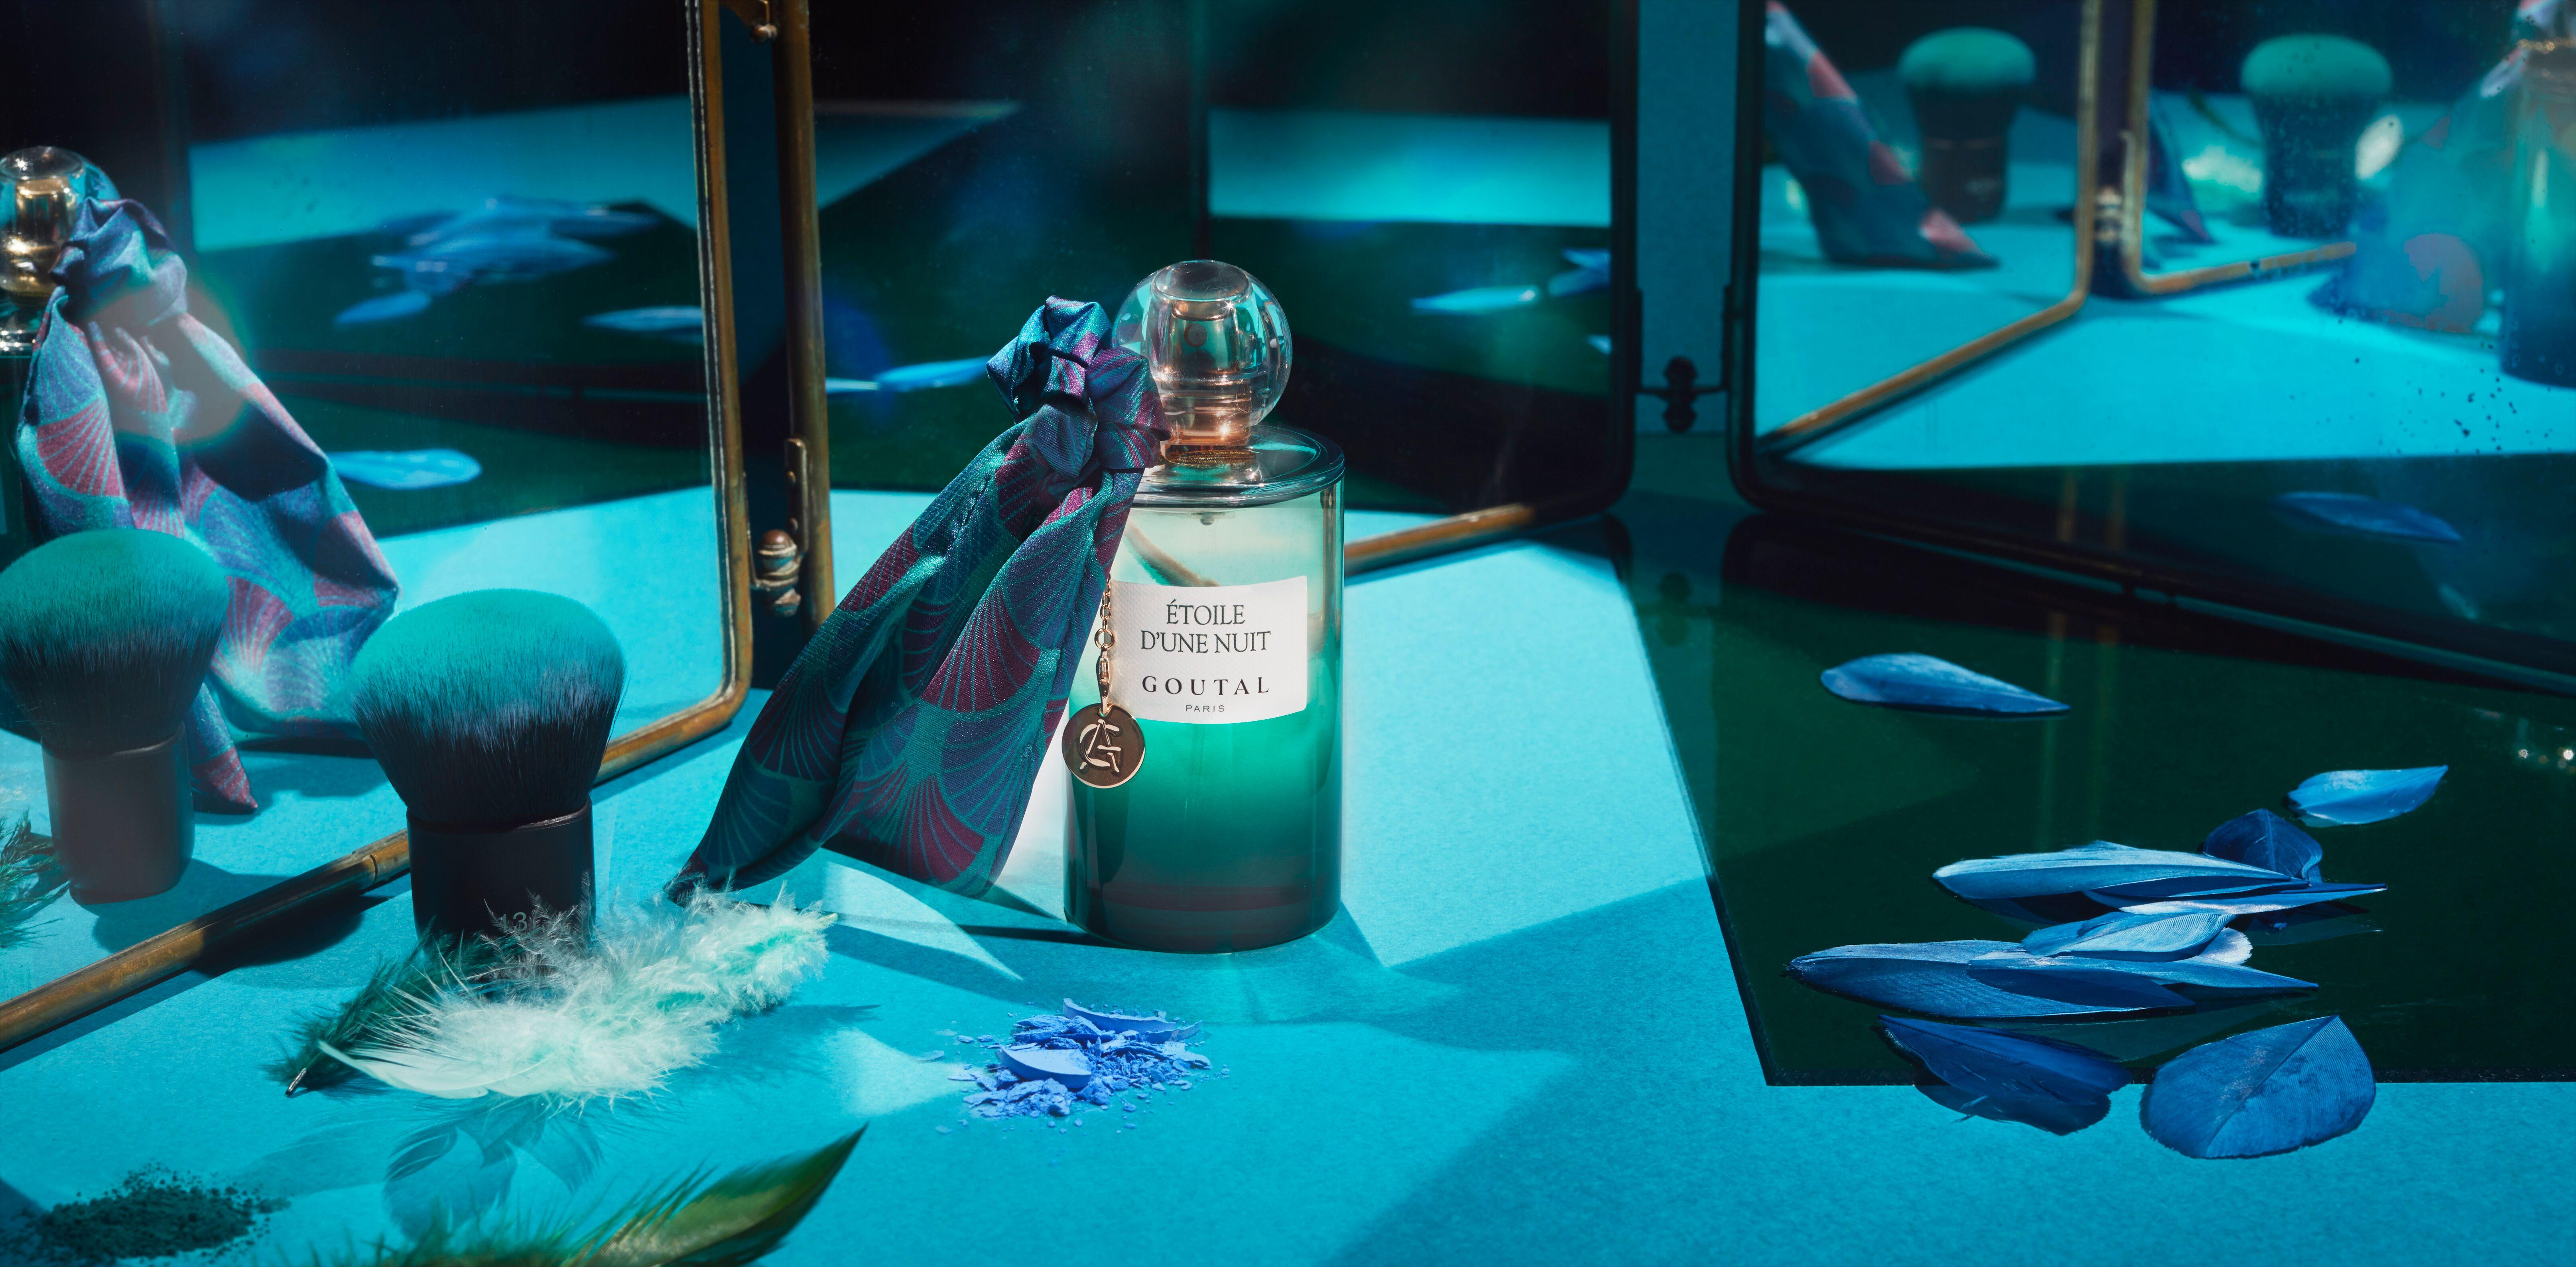 The new perfume Etoile d'Une Nuit